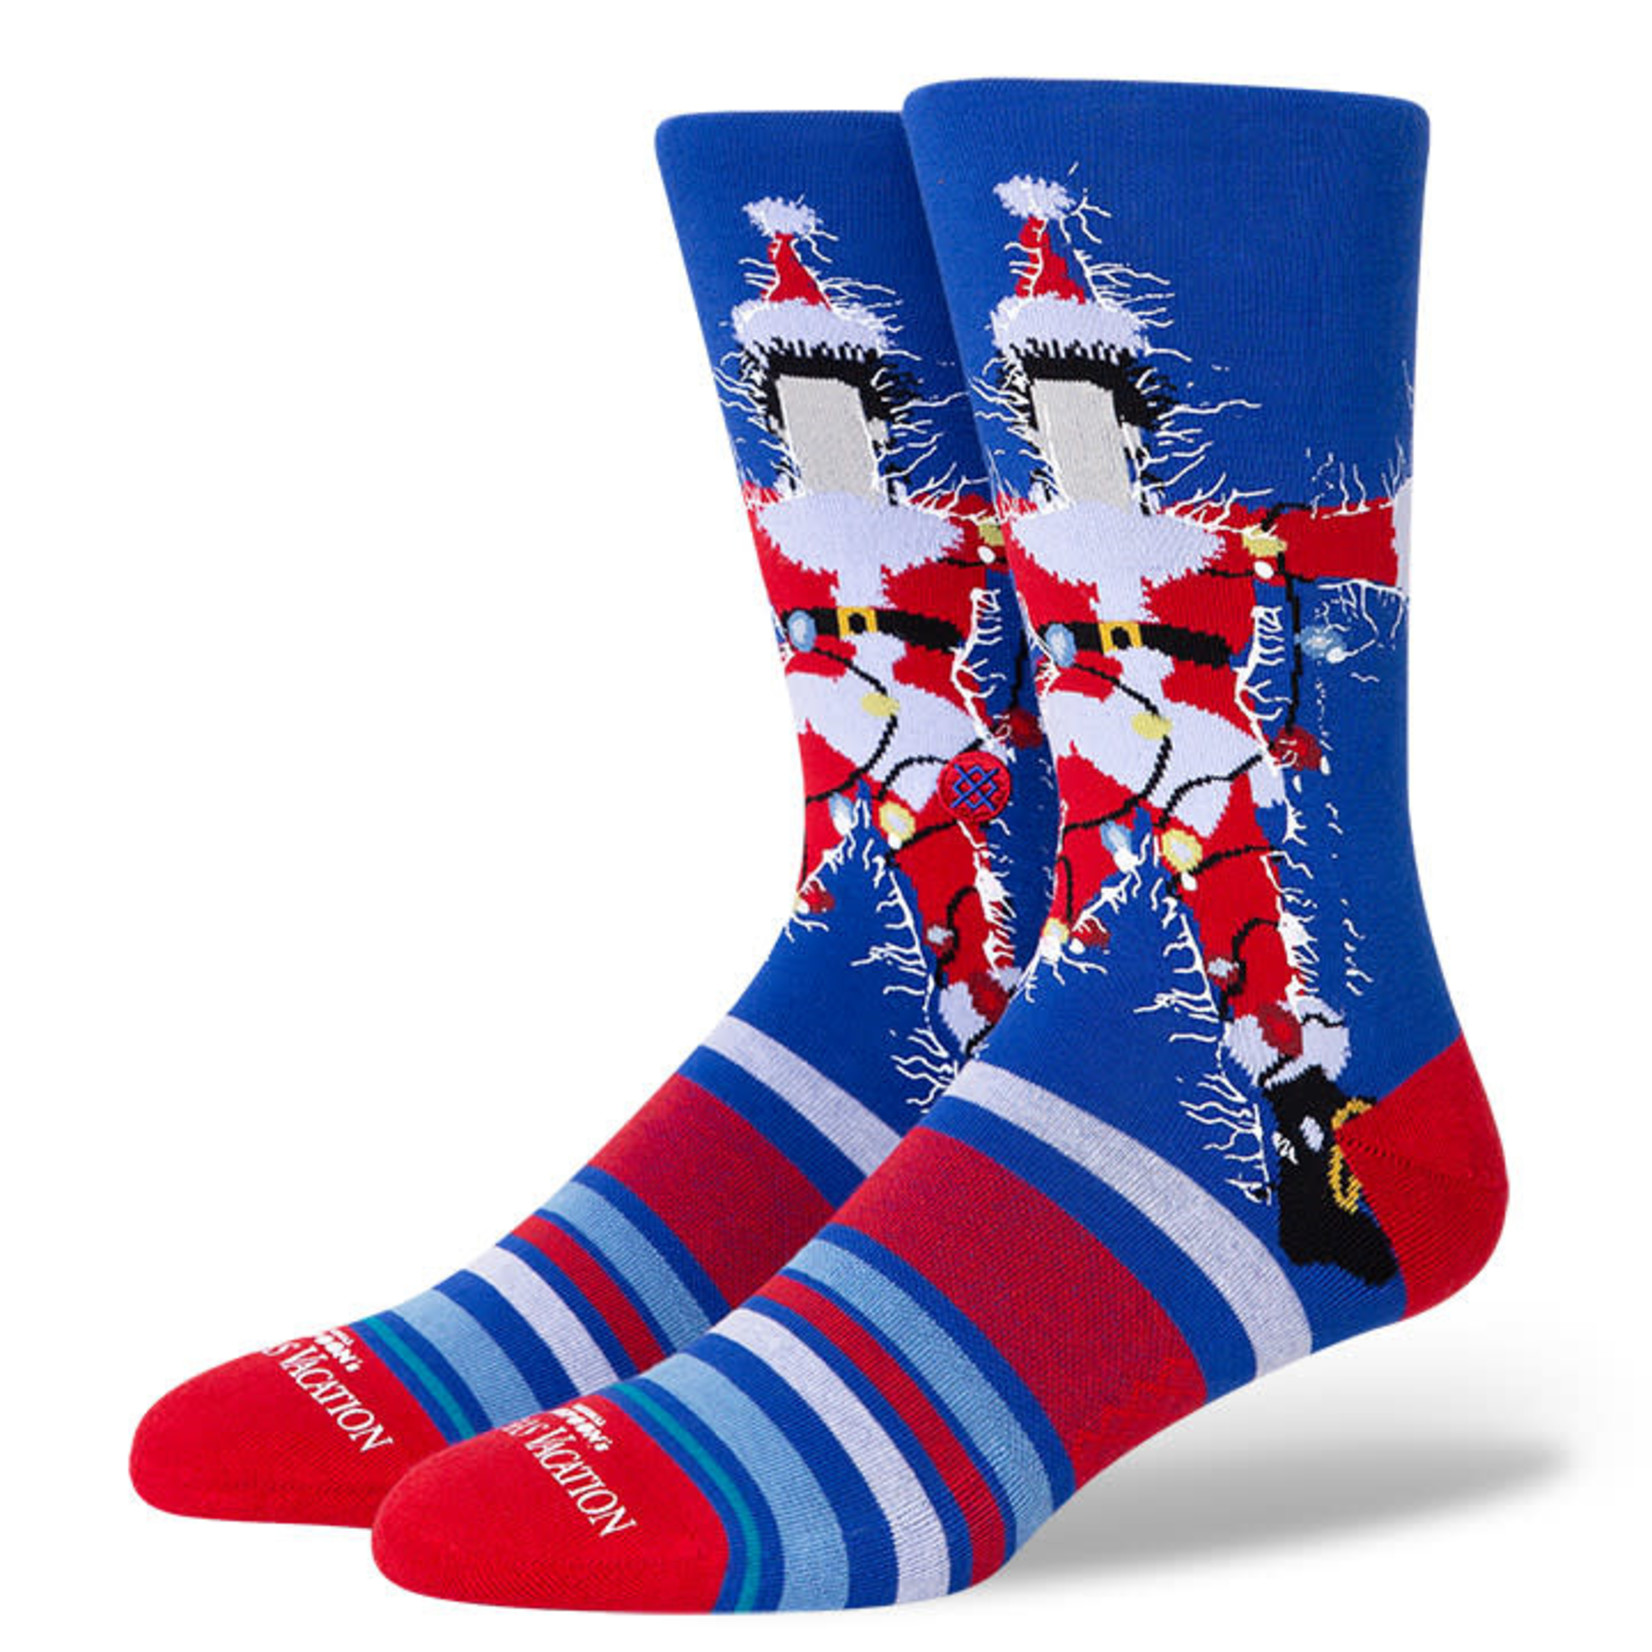 Stance Stance Sock Christmas Vacation L(Men 9-13 / Women 11-14)